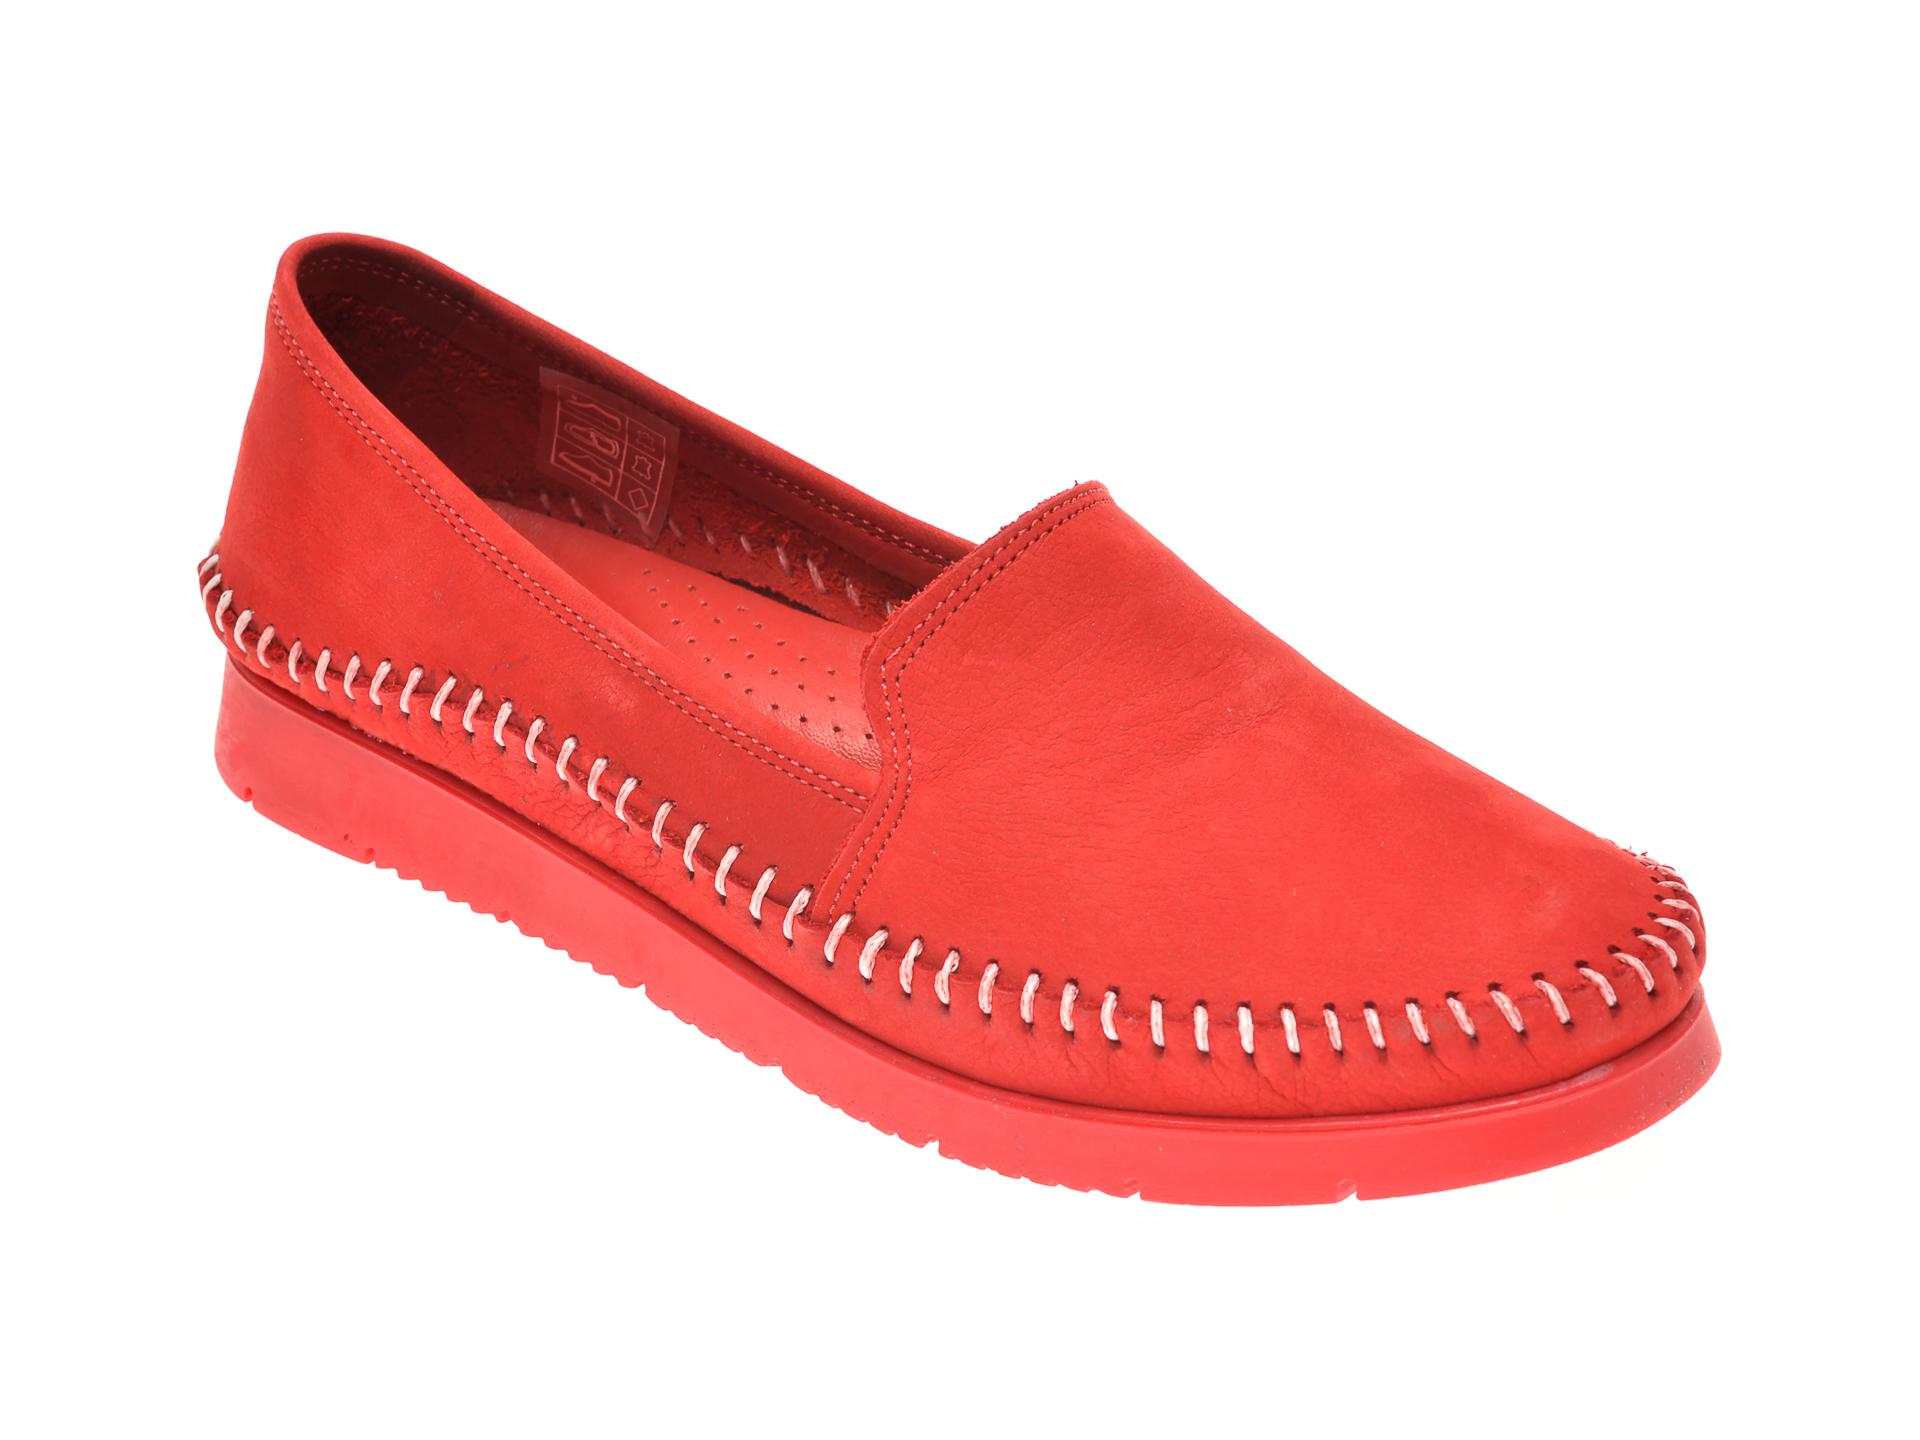 Pantofi SHE FAME rosii, 1427, din piele naturala